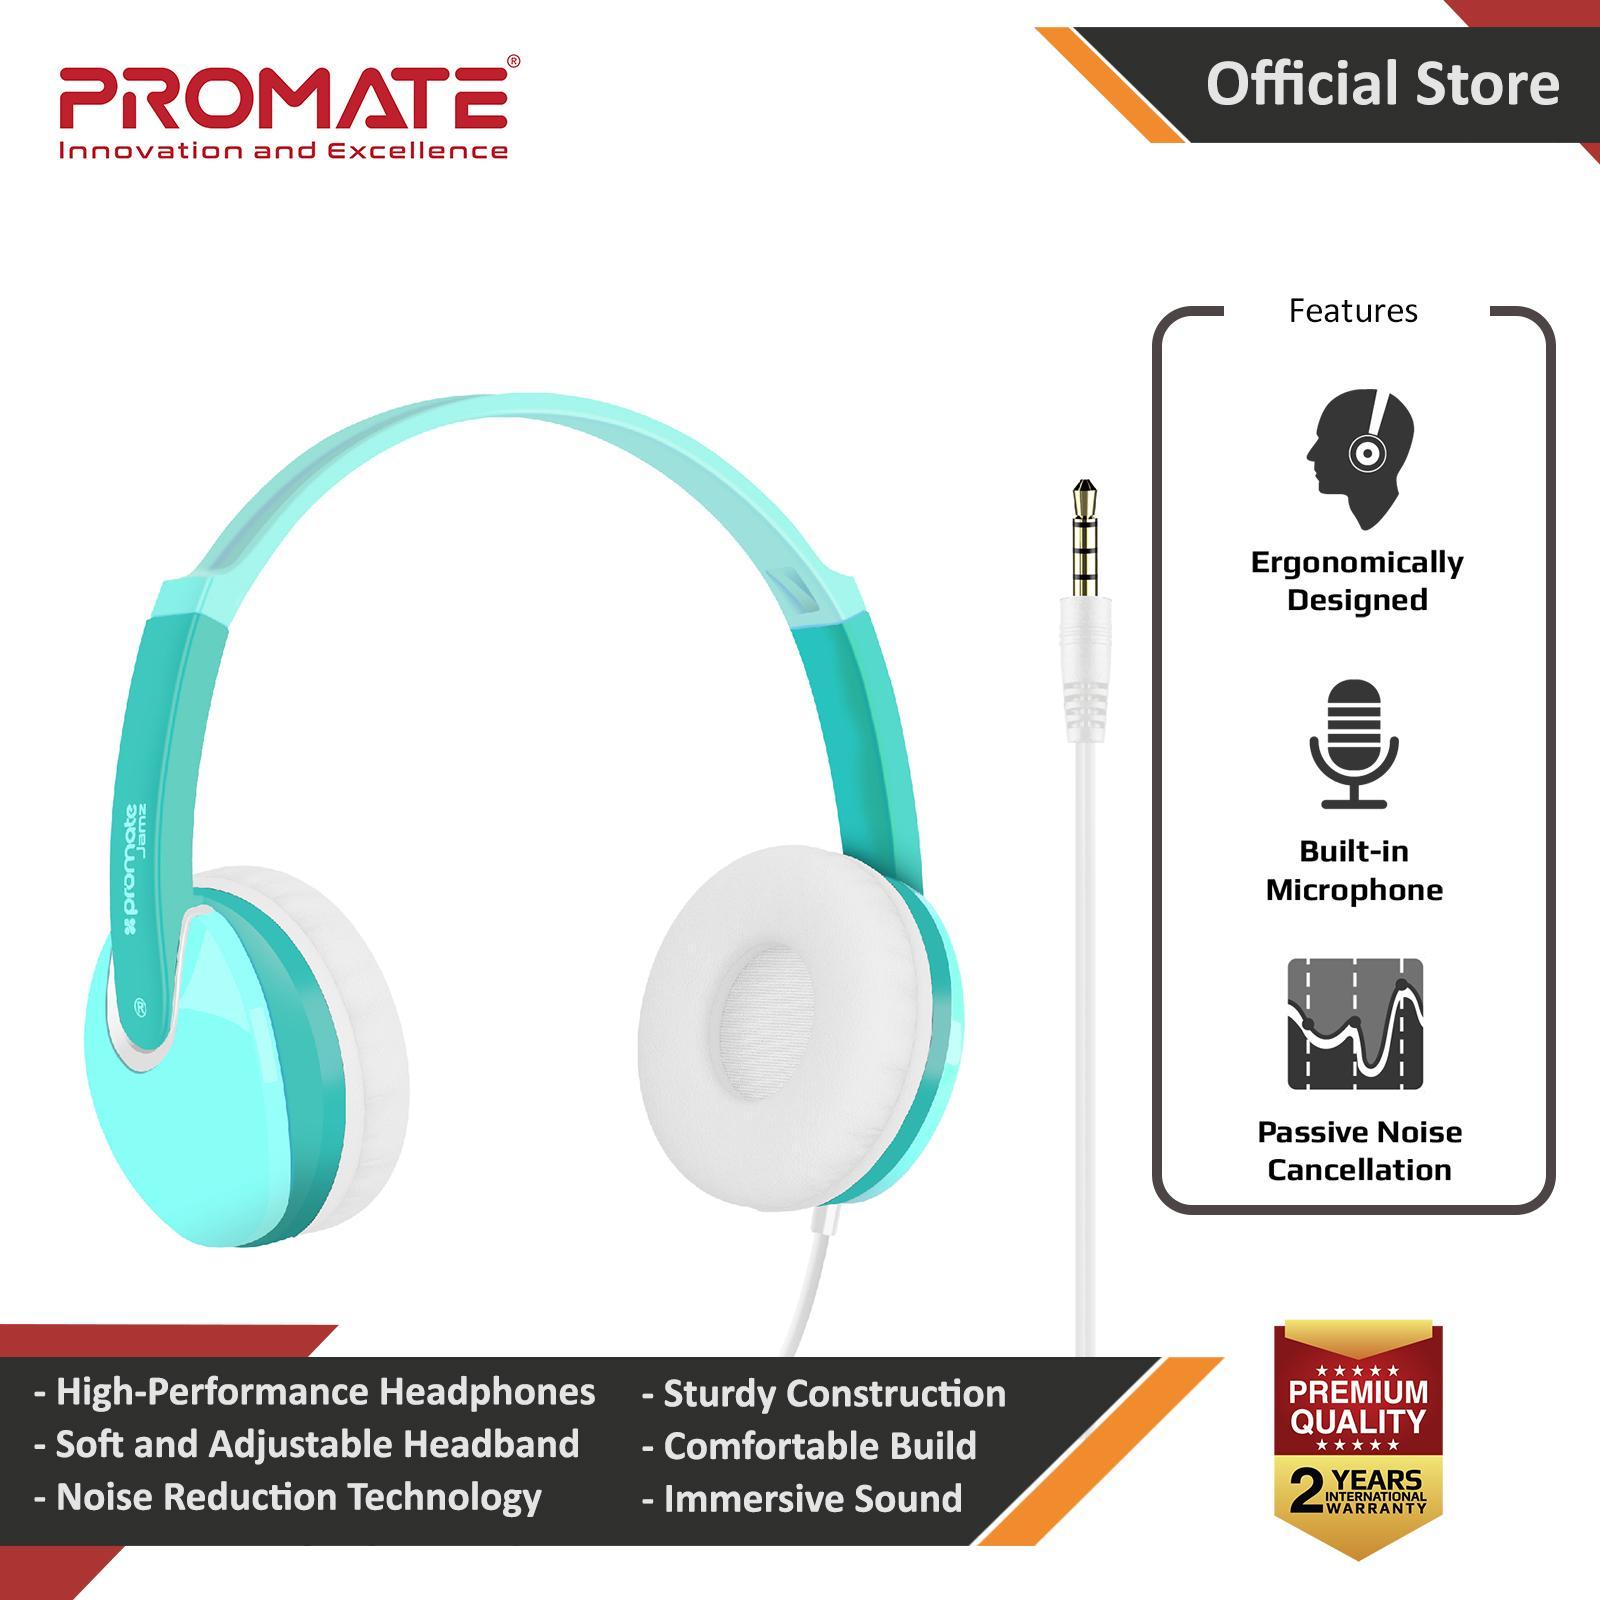 5d6ab2d6aca Promate Jamz Kids Headphones, Lightweight Over-Ear Wired HiFi Stereo  Adjustable Headphones with Built